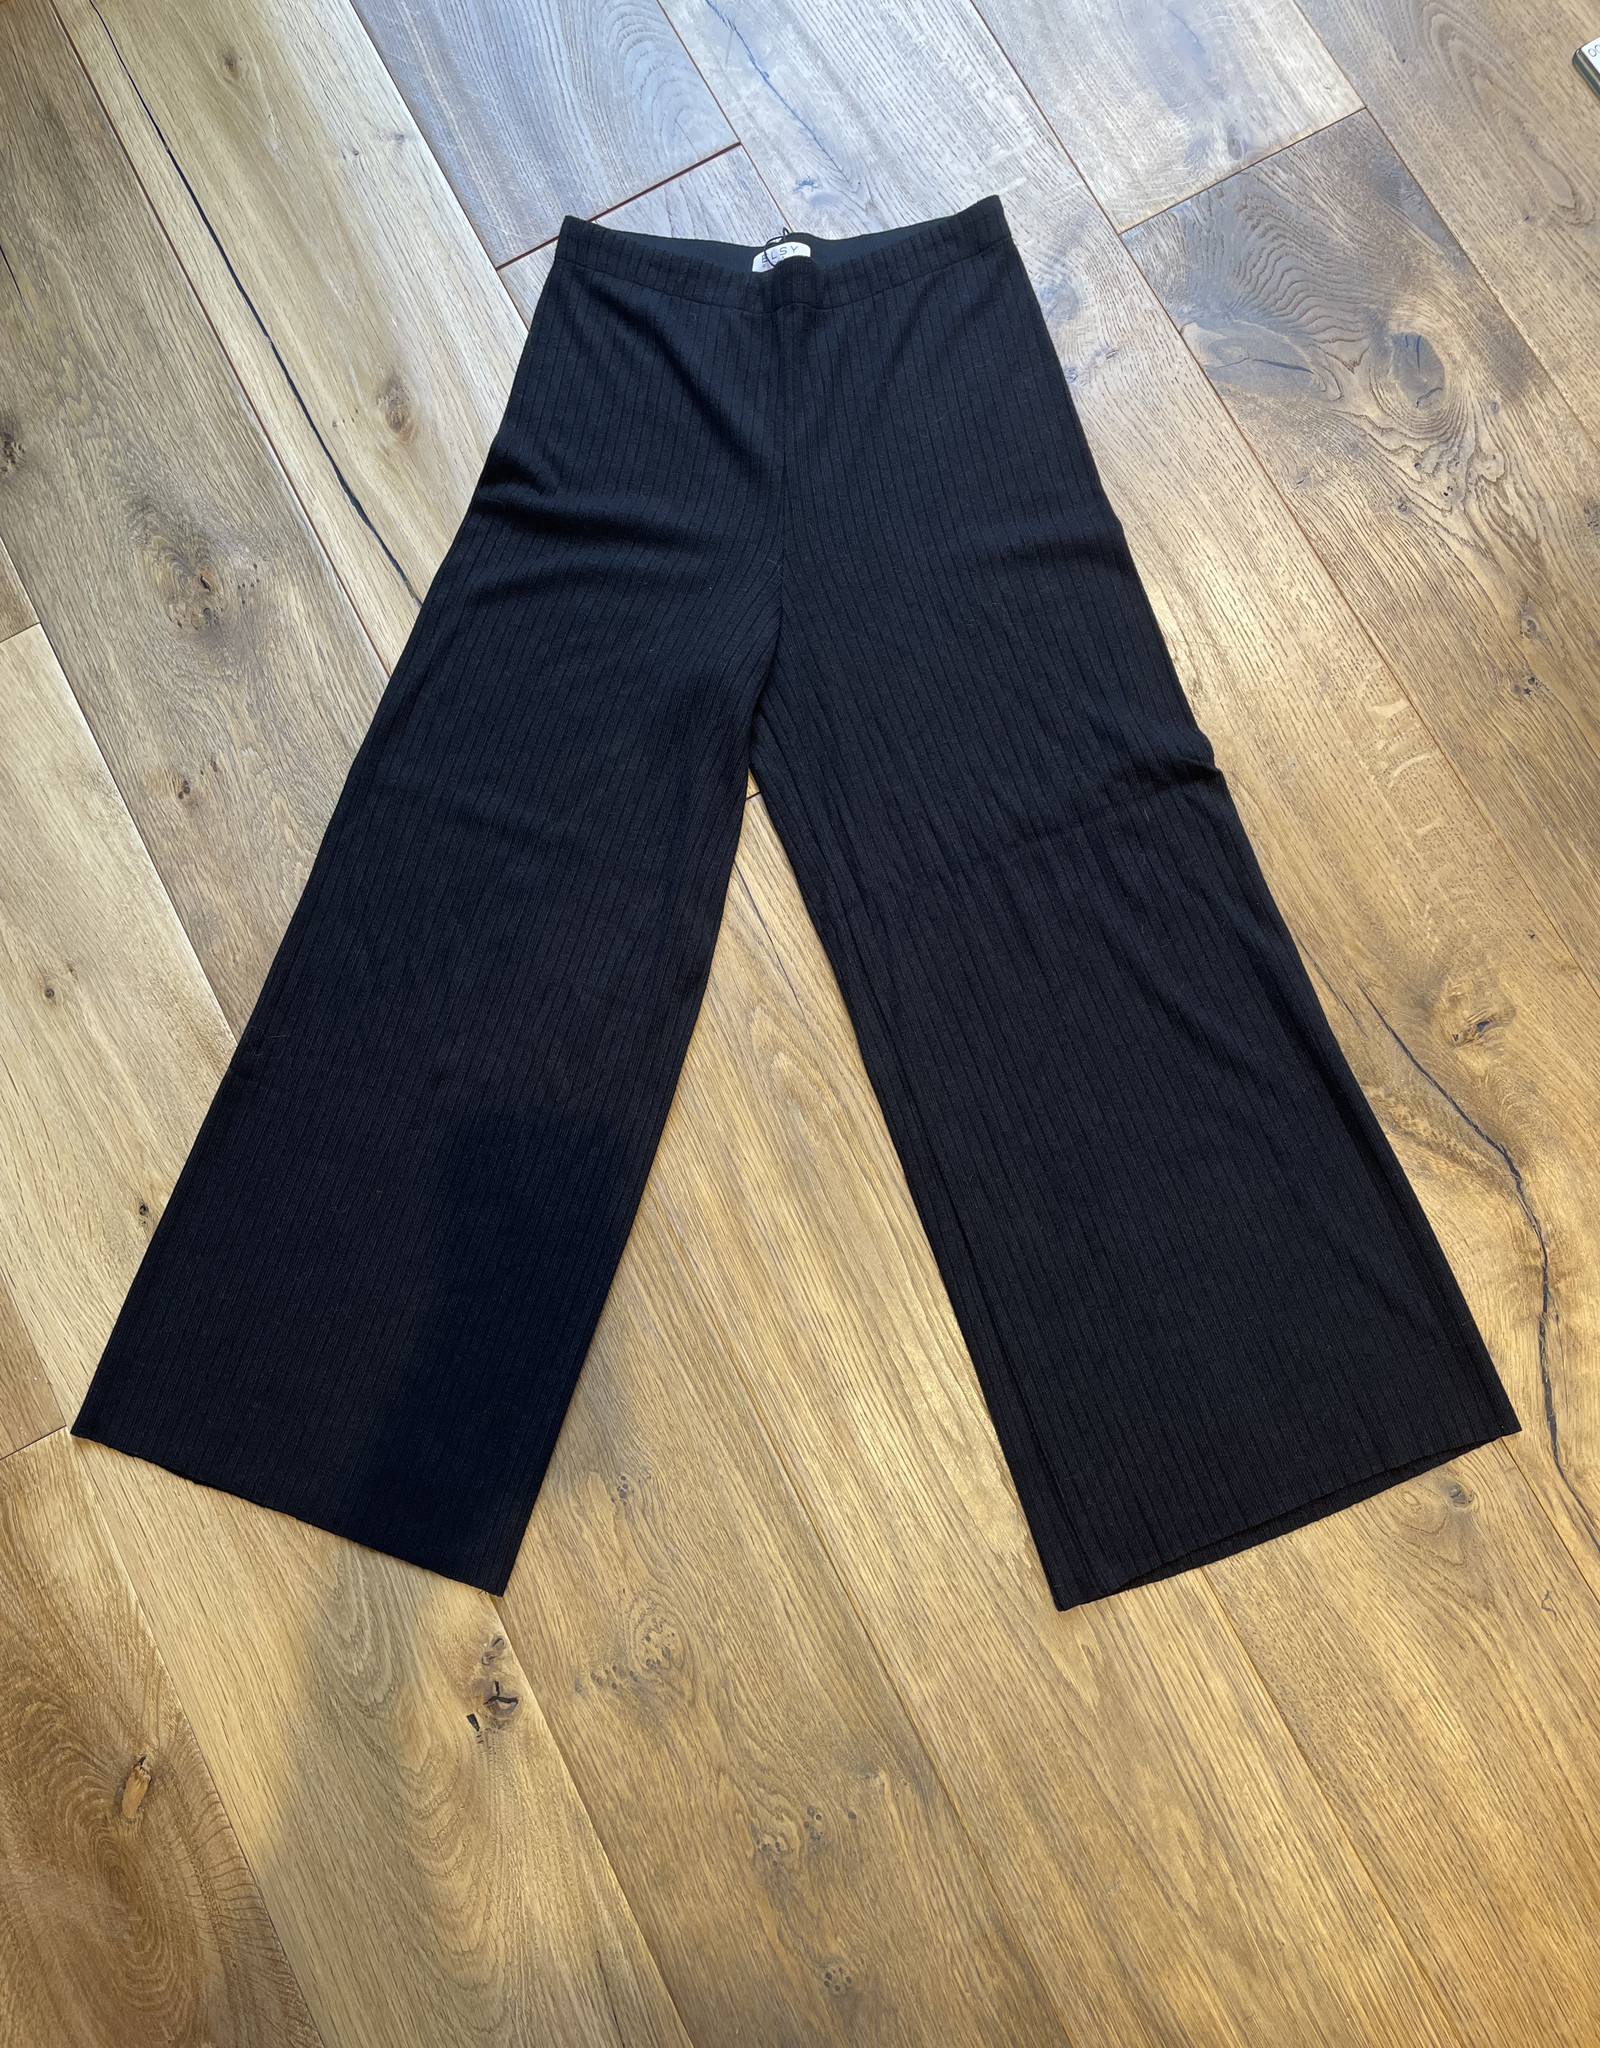 ELSY ELSY Iliade broek zwart